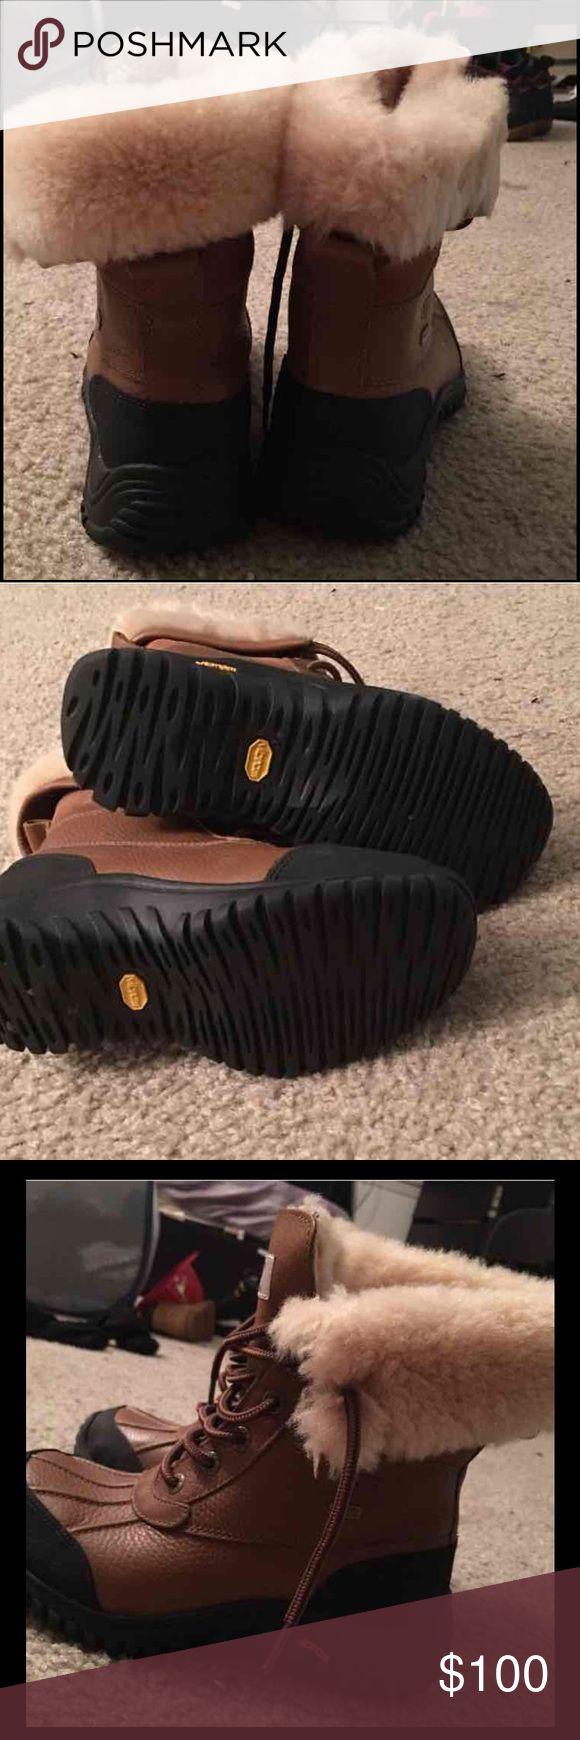 ugug ugg adirondack tall , brand new authentic, UGG Shoes